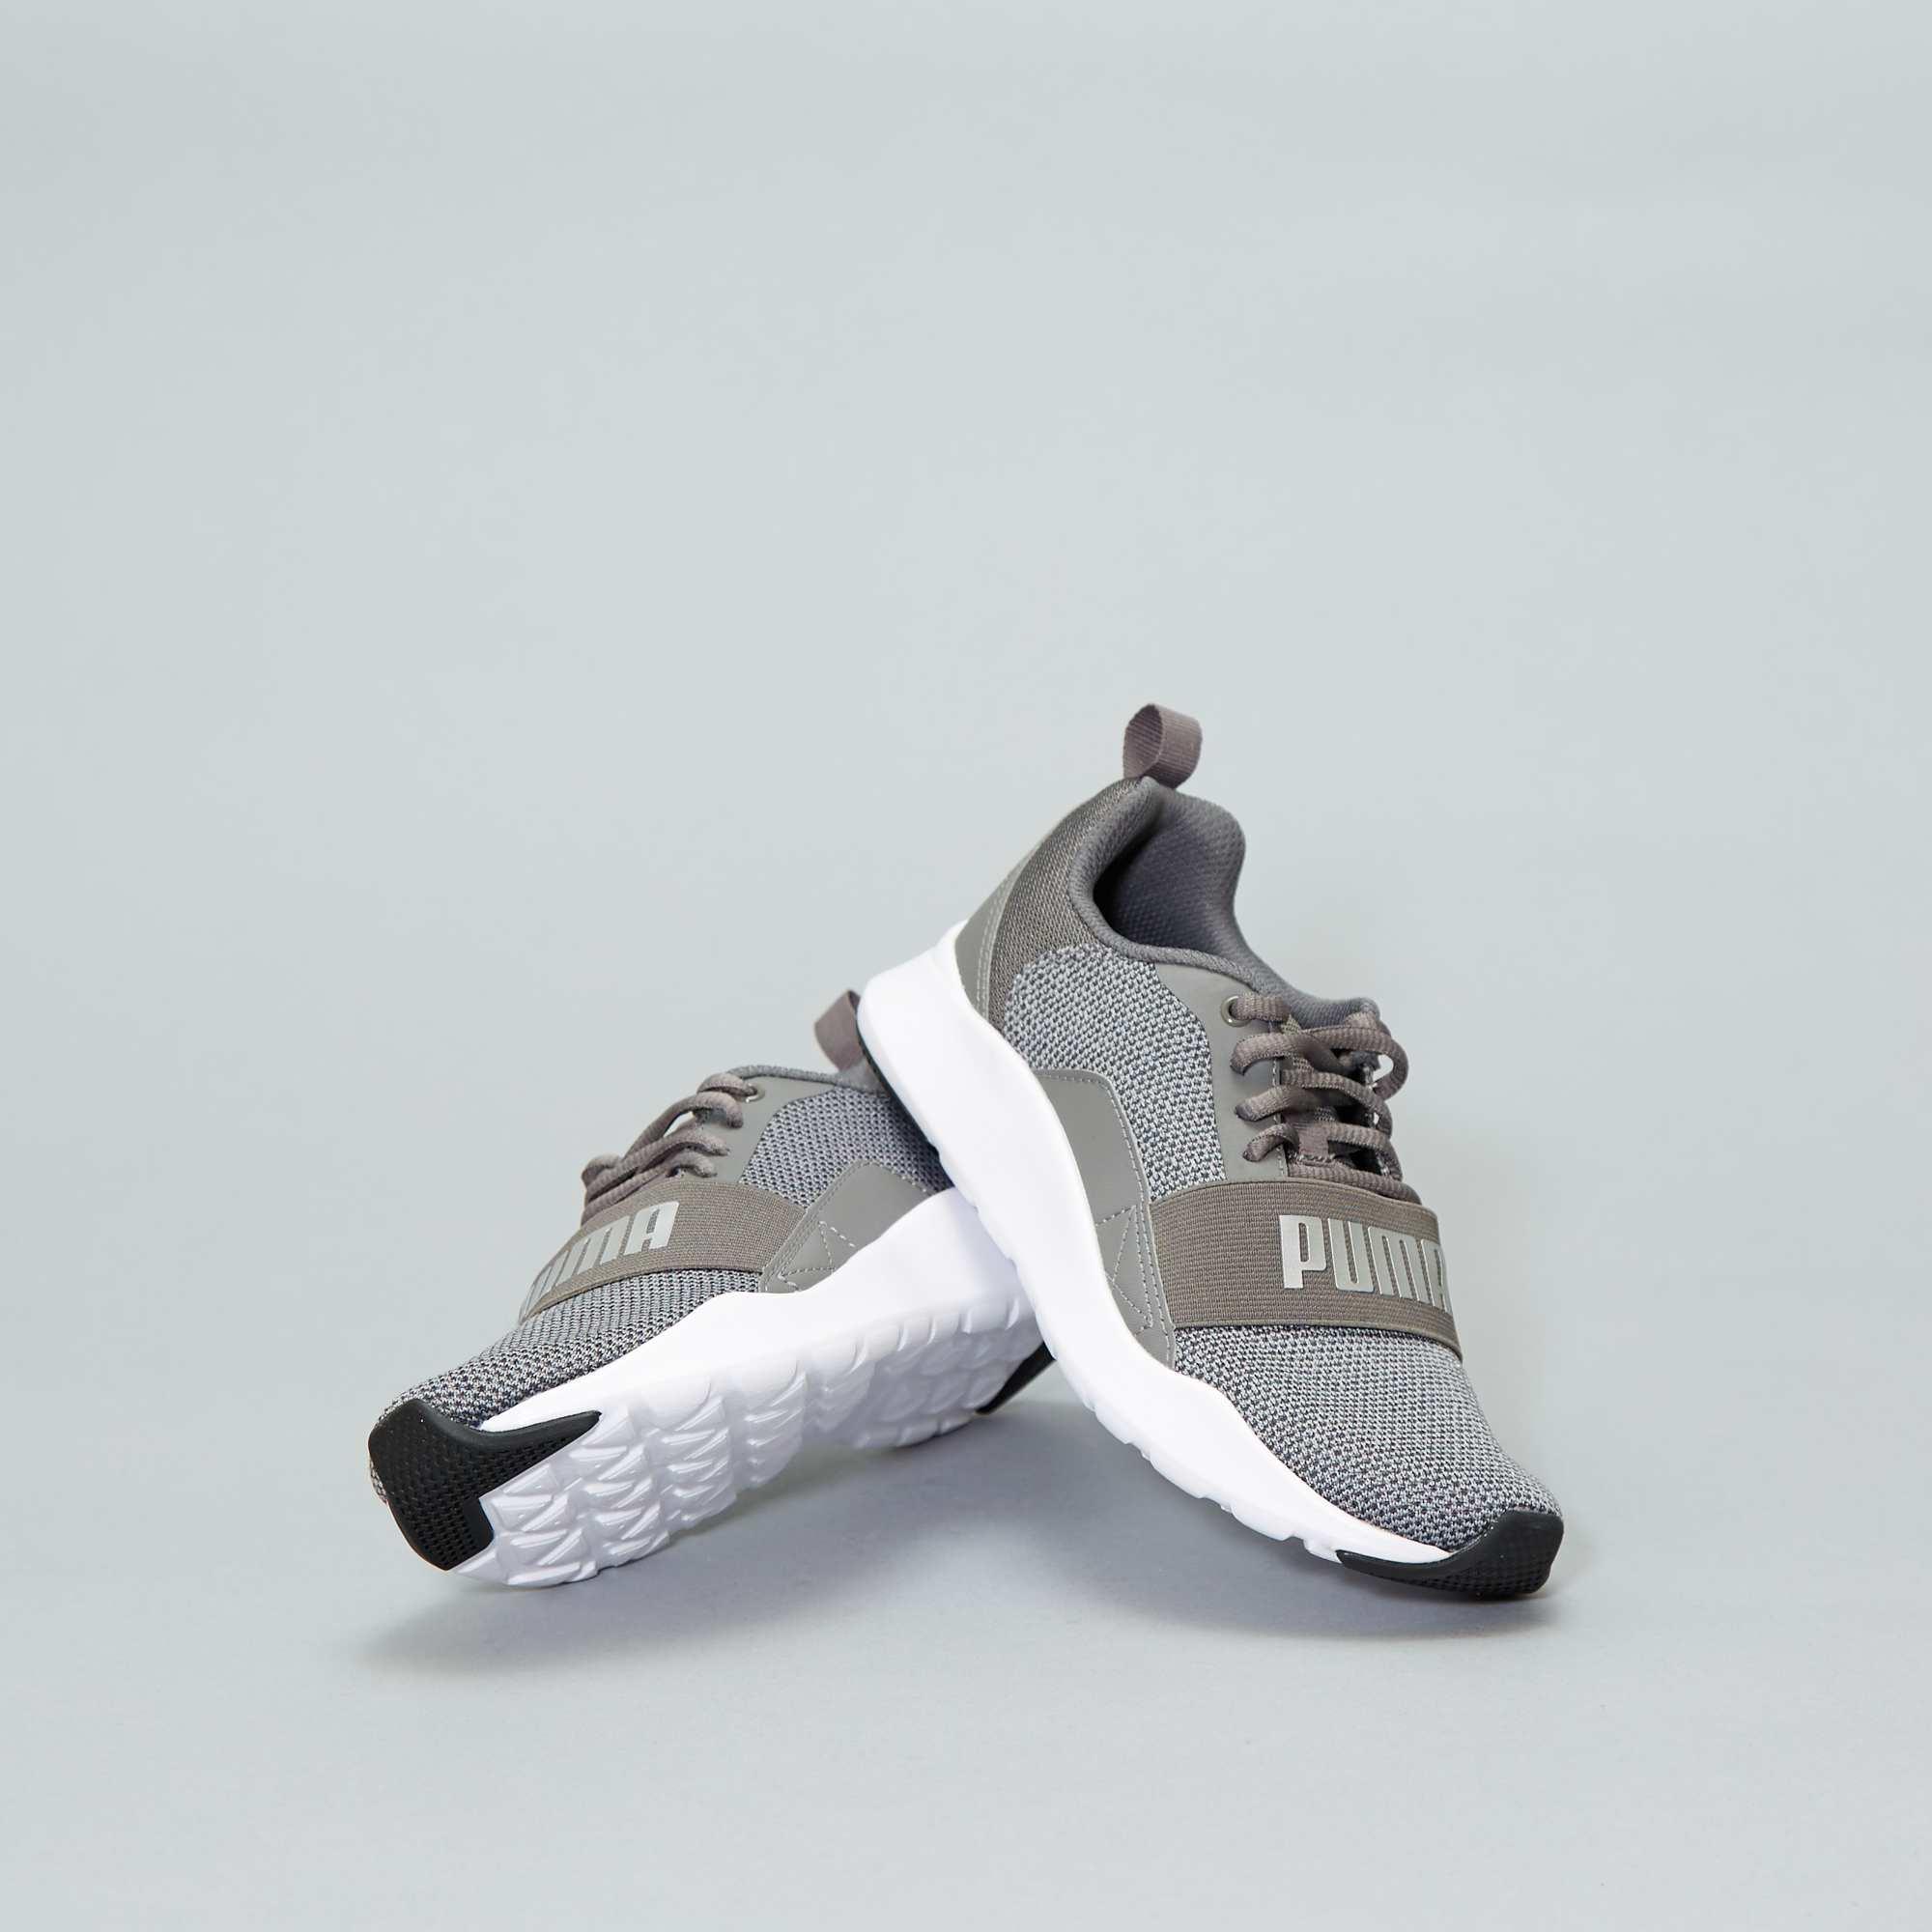 5433aa2d6 Zapatillas 'Puma Wired' Joven niño - NEGRO - Kiabi - 45,00€